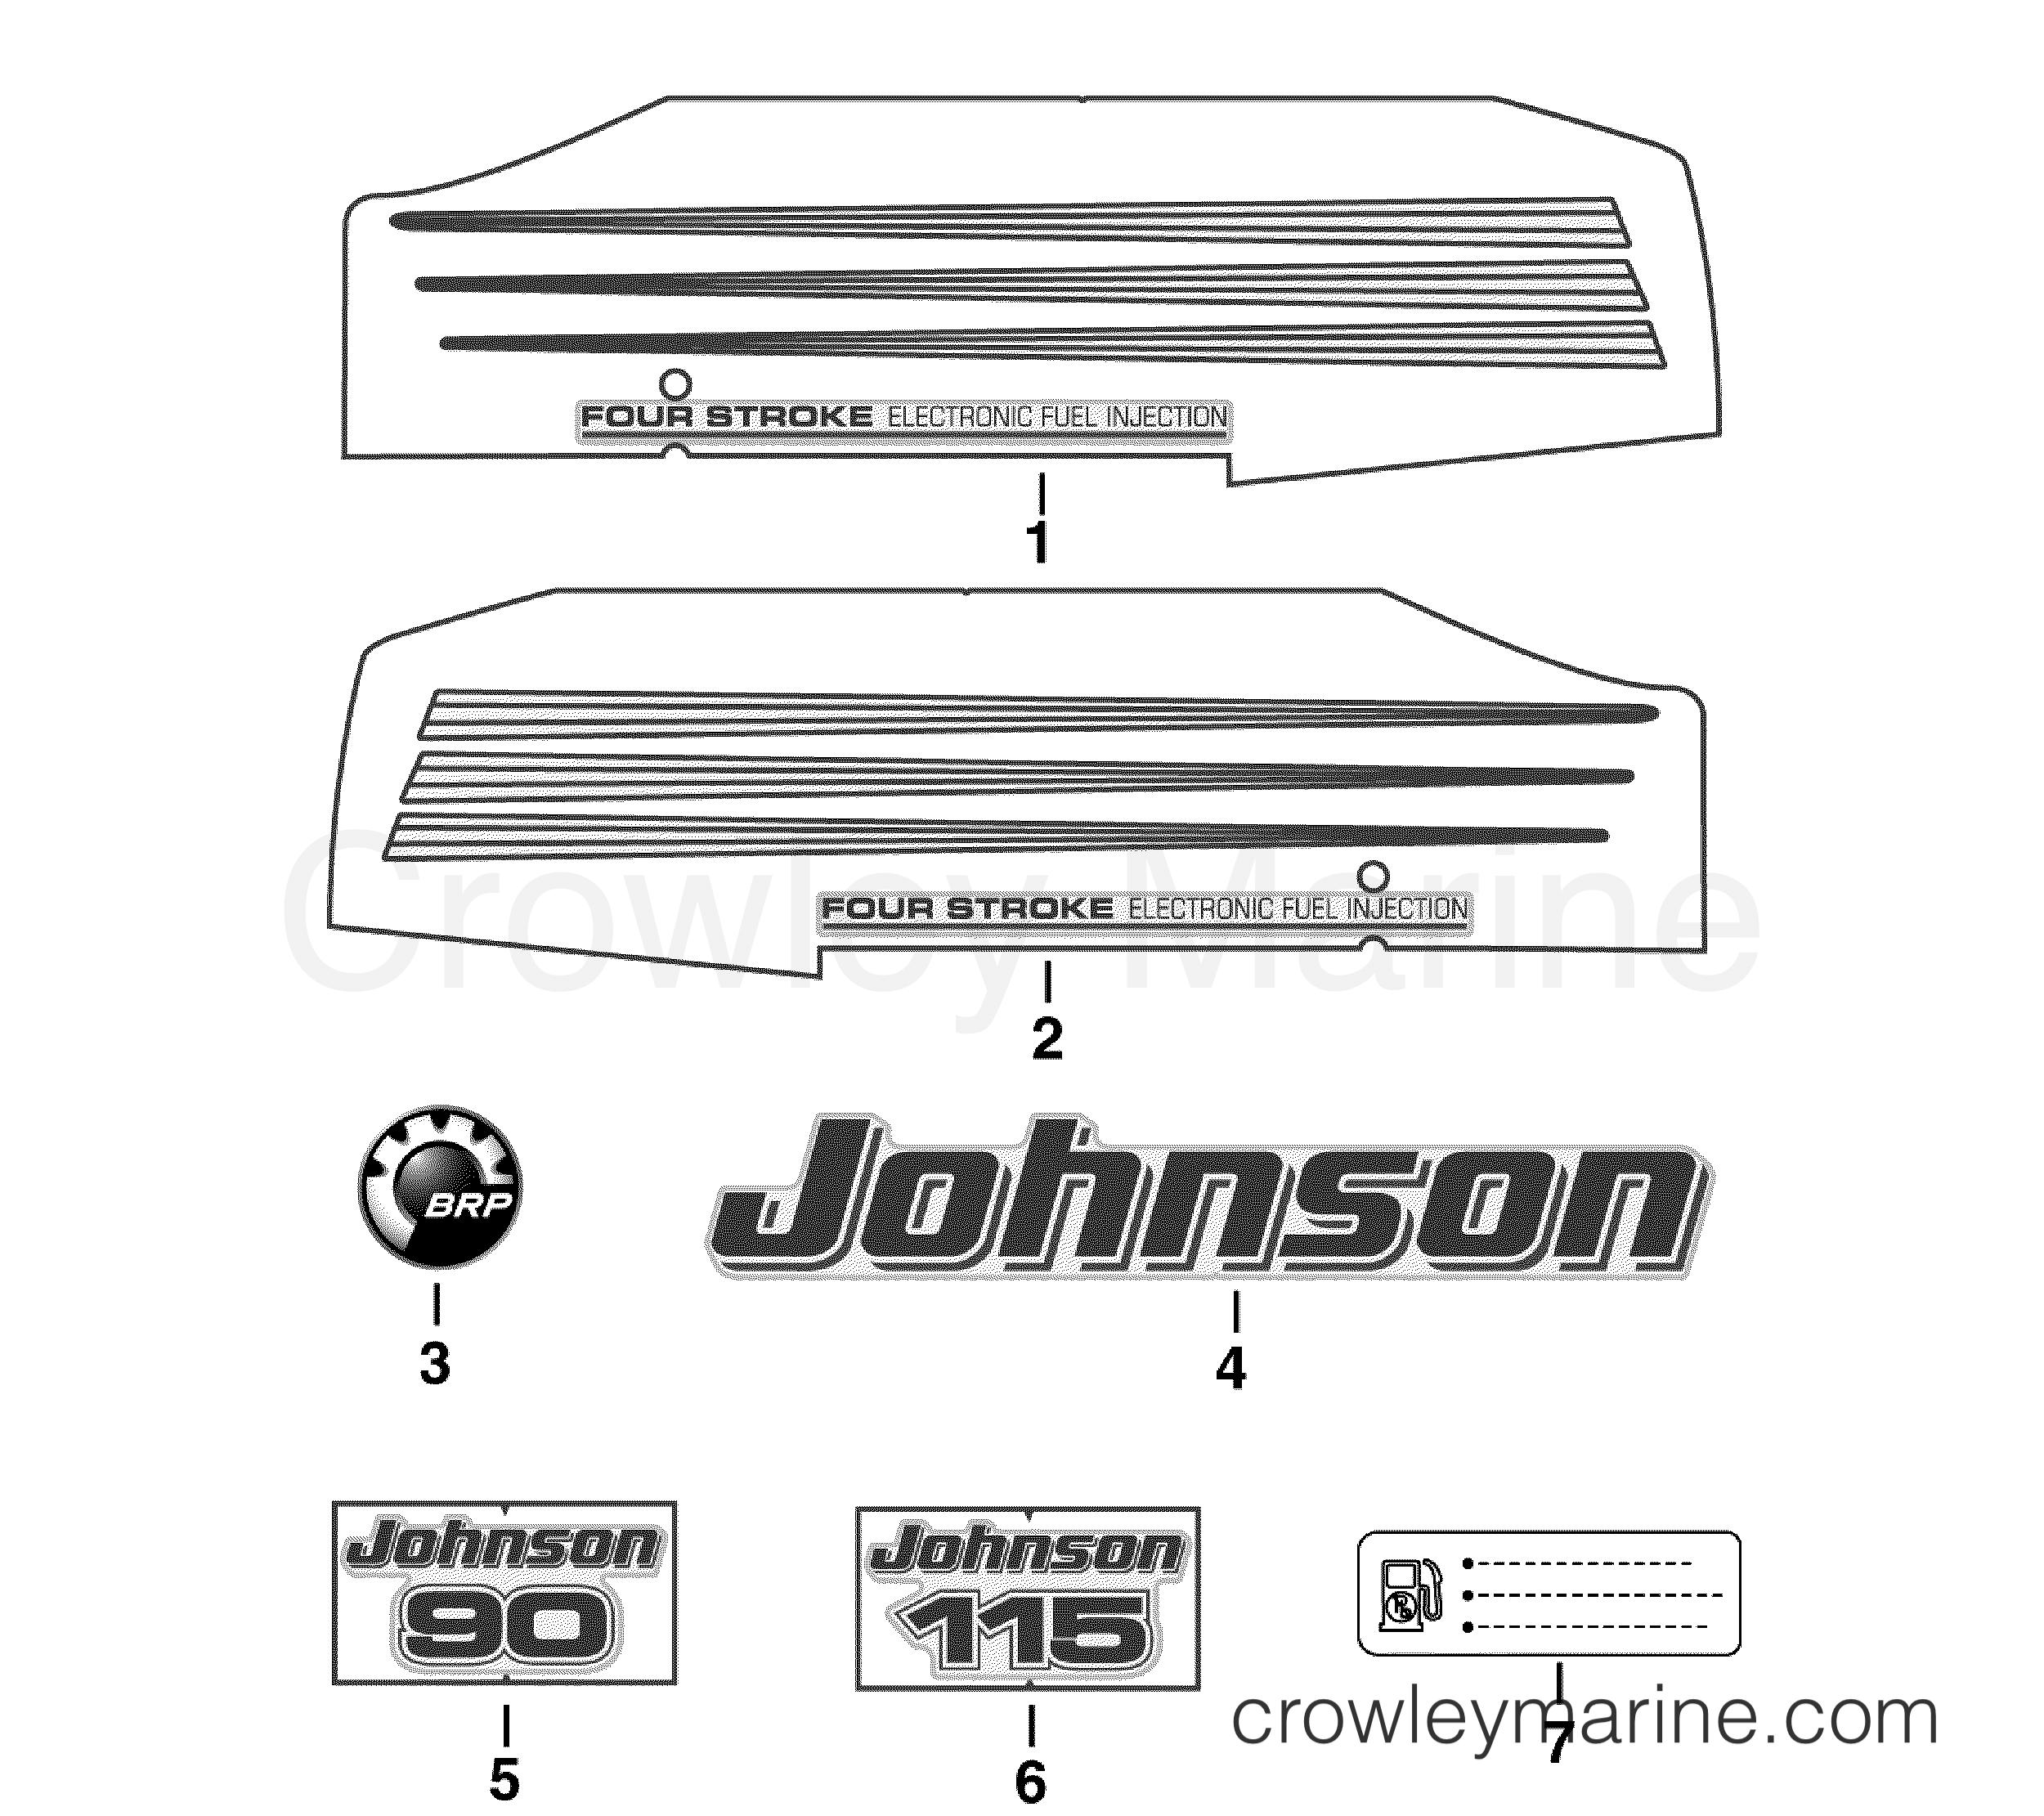 DECALS - 2006 Johnson Outboards 115 J115PL4SDA | Crowley Marine